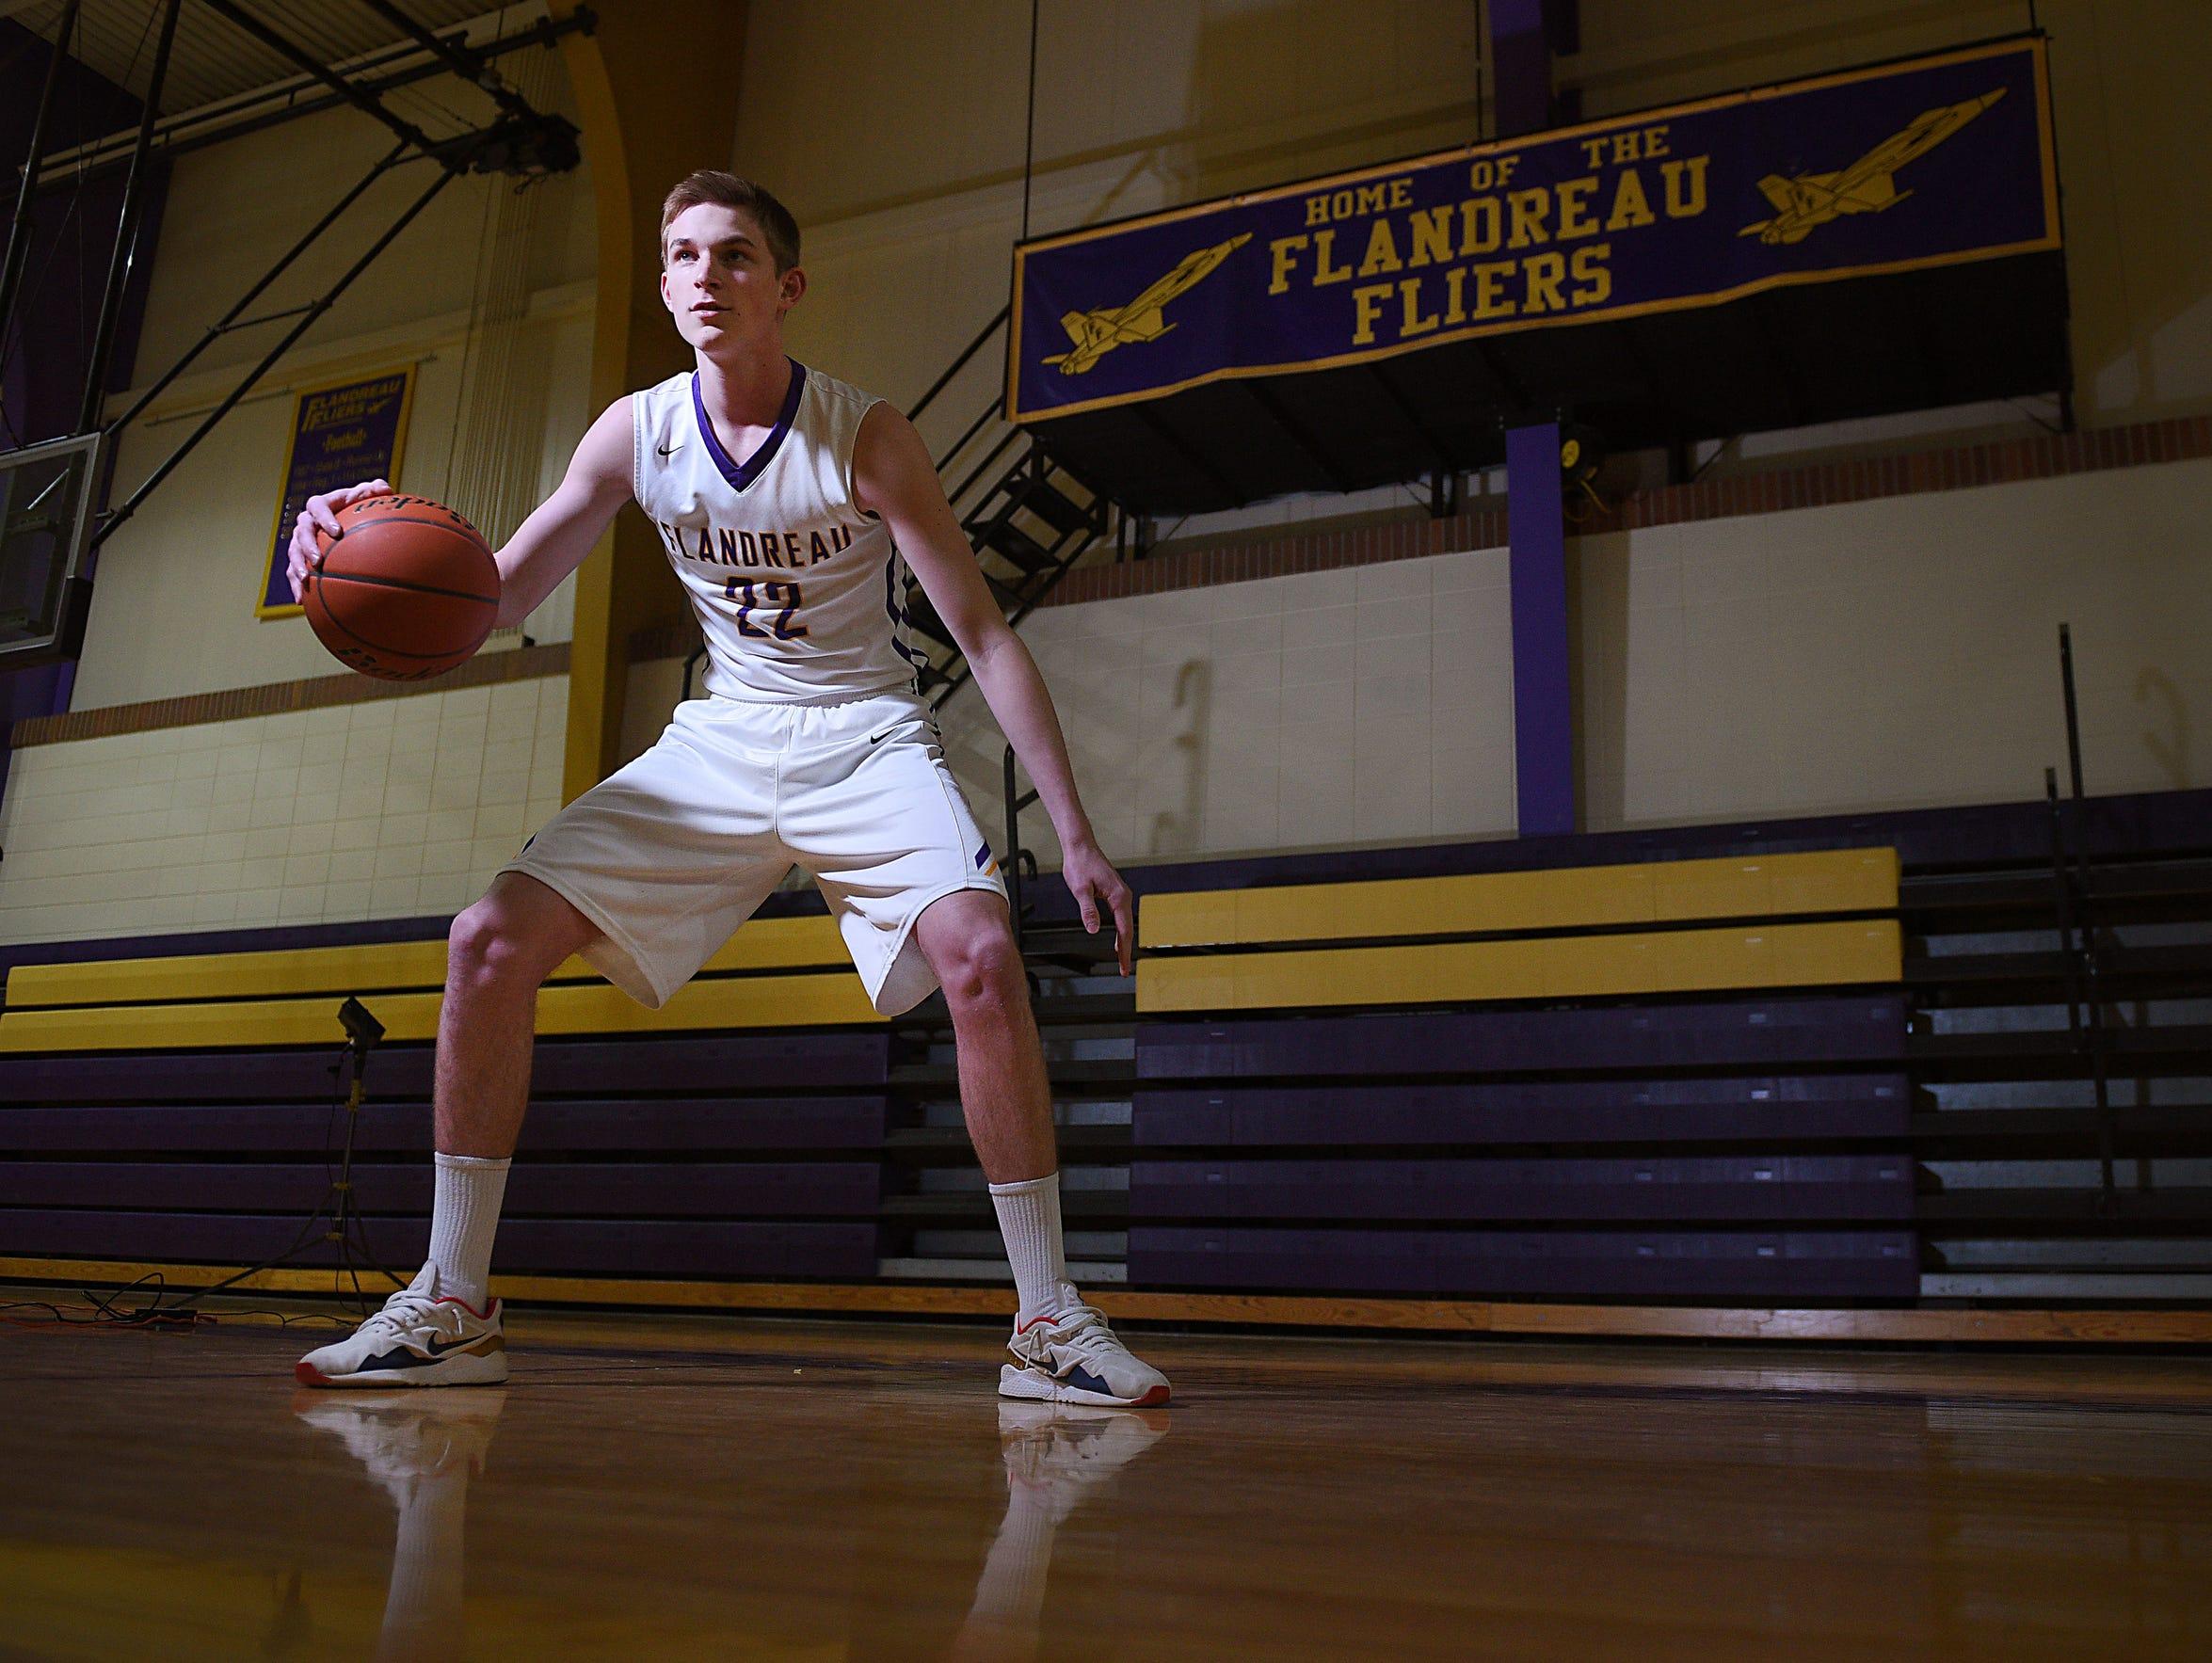 Flandreau High School senior Dylan LeBrun, a First